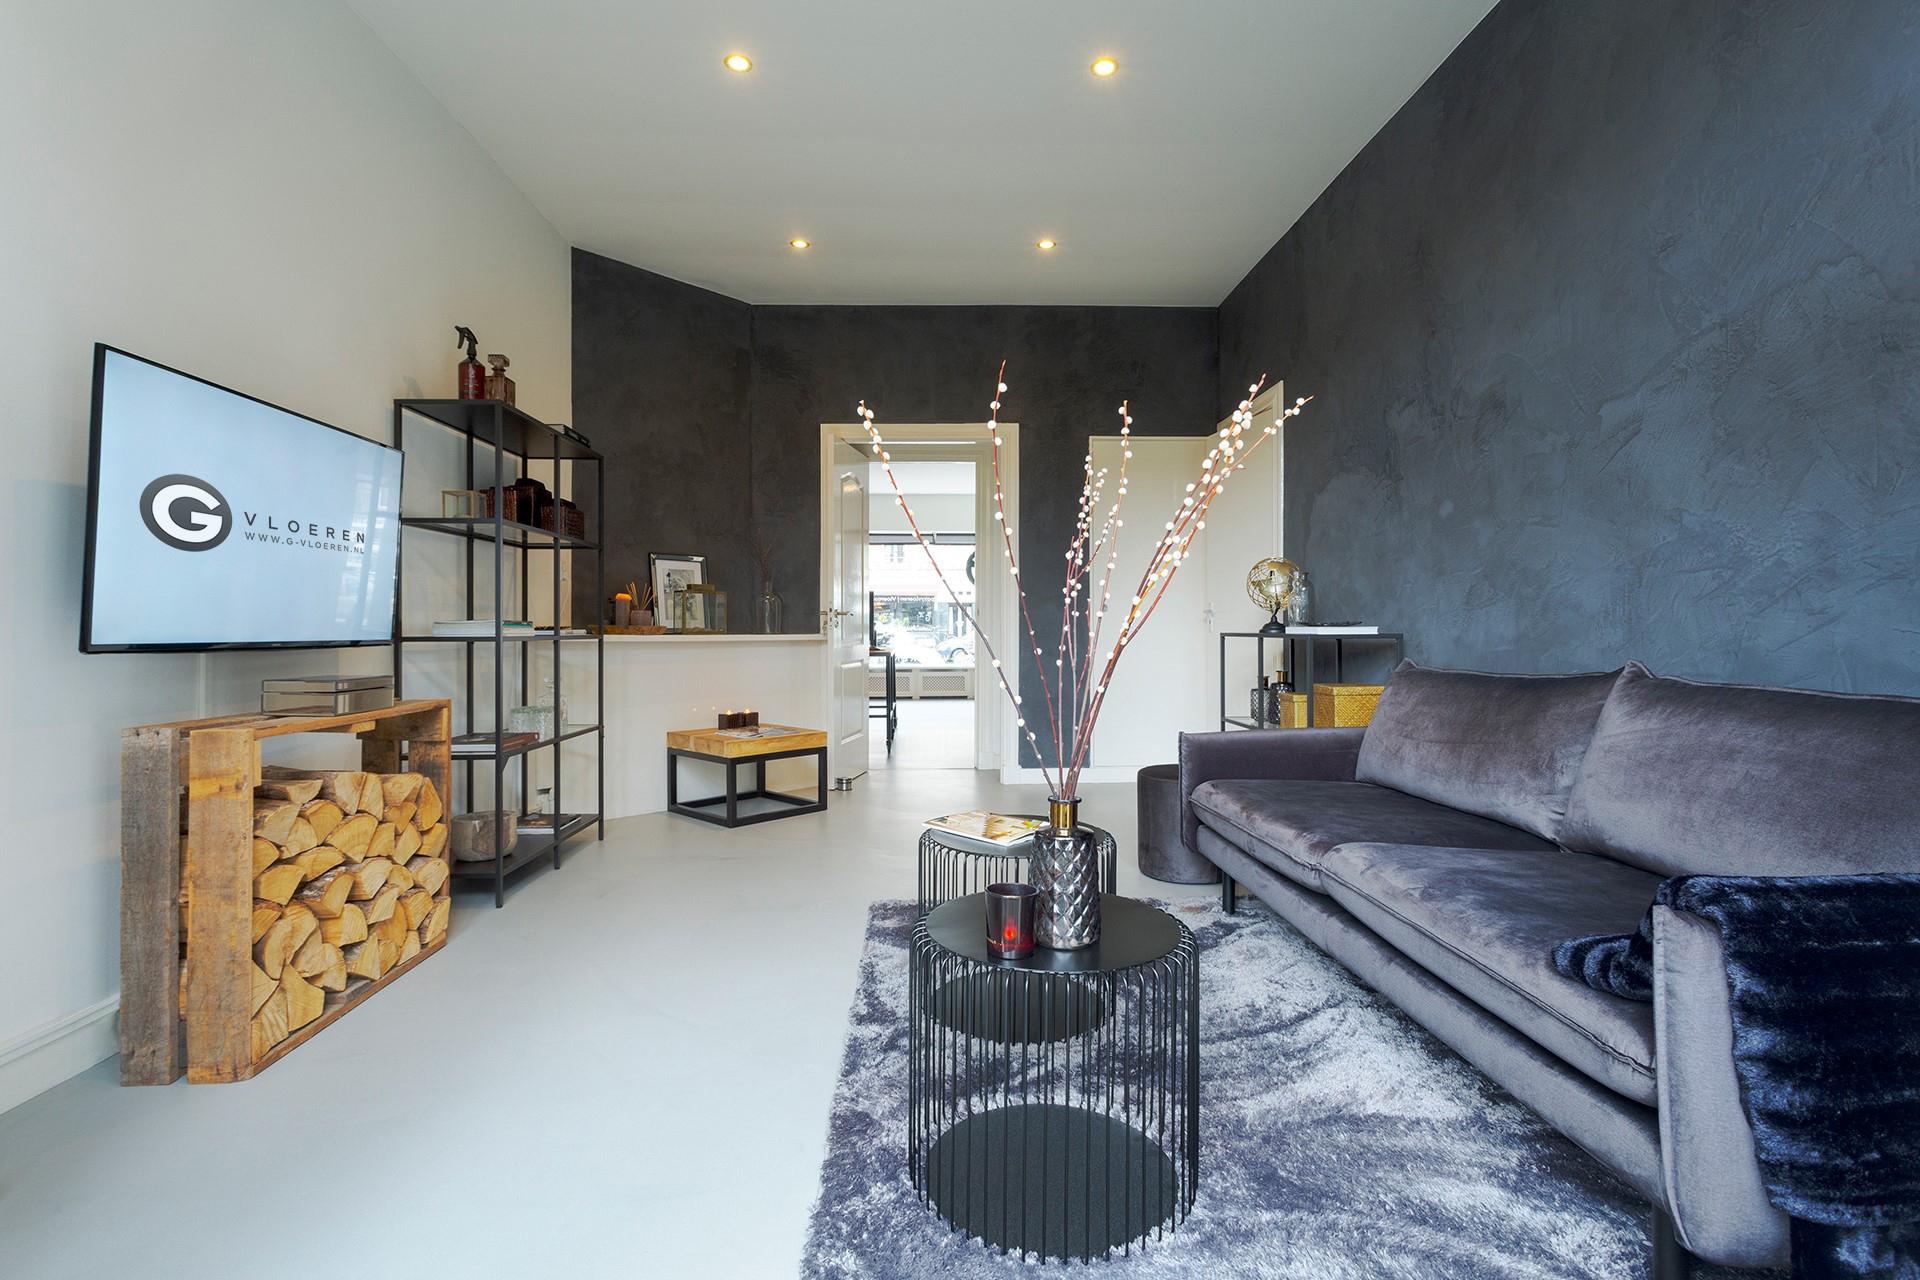 G-vloeren showroom woonbeton